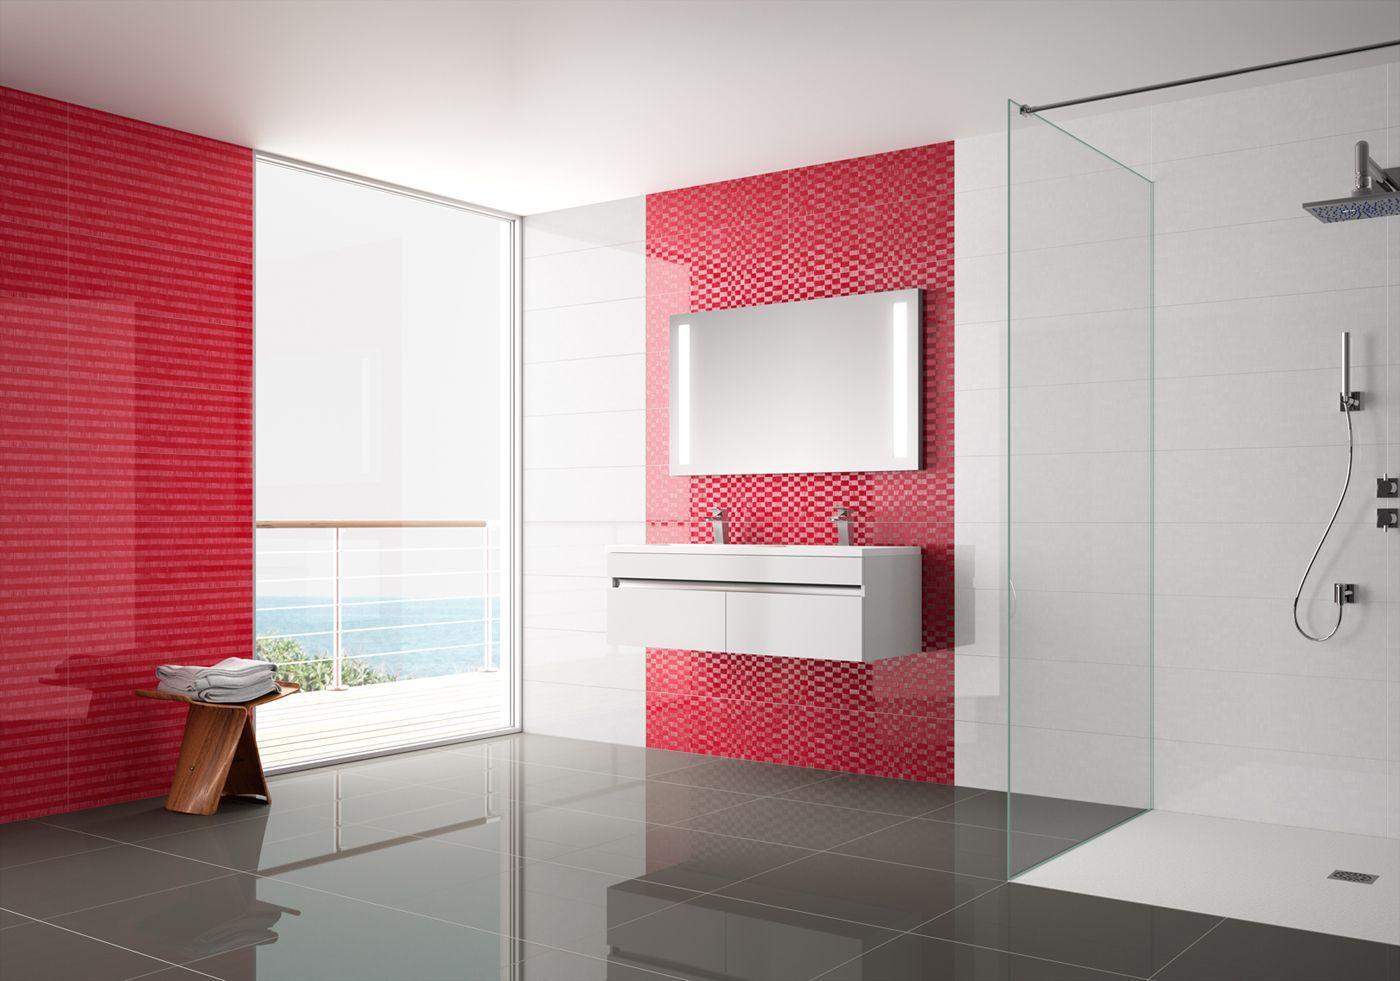 Kitchen tile / wall / porcelain stoneware / plain - AKIRA - PAVIGRES ...